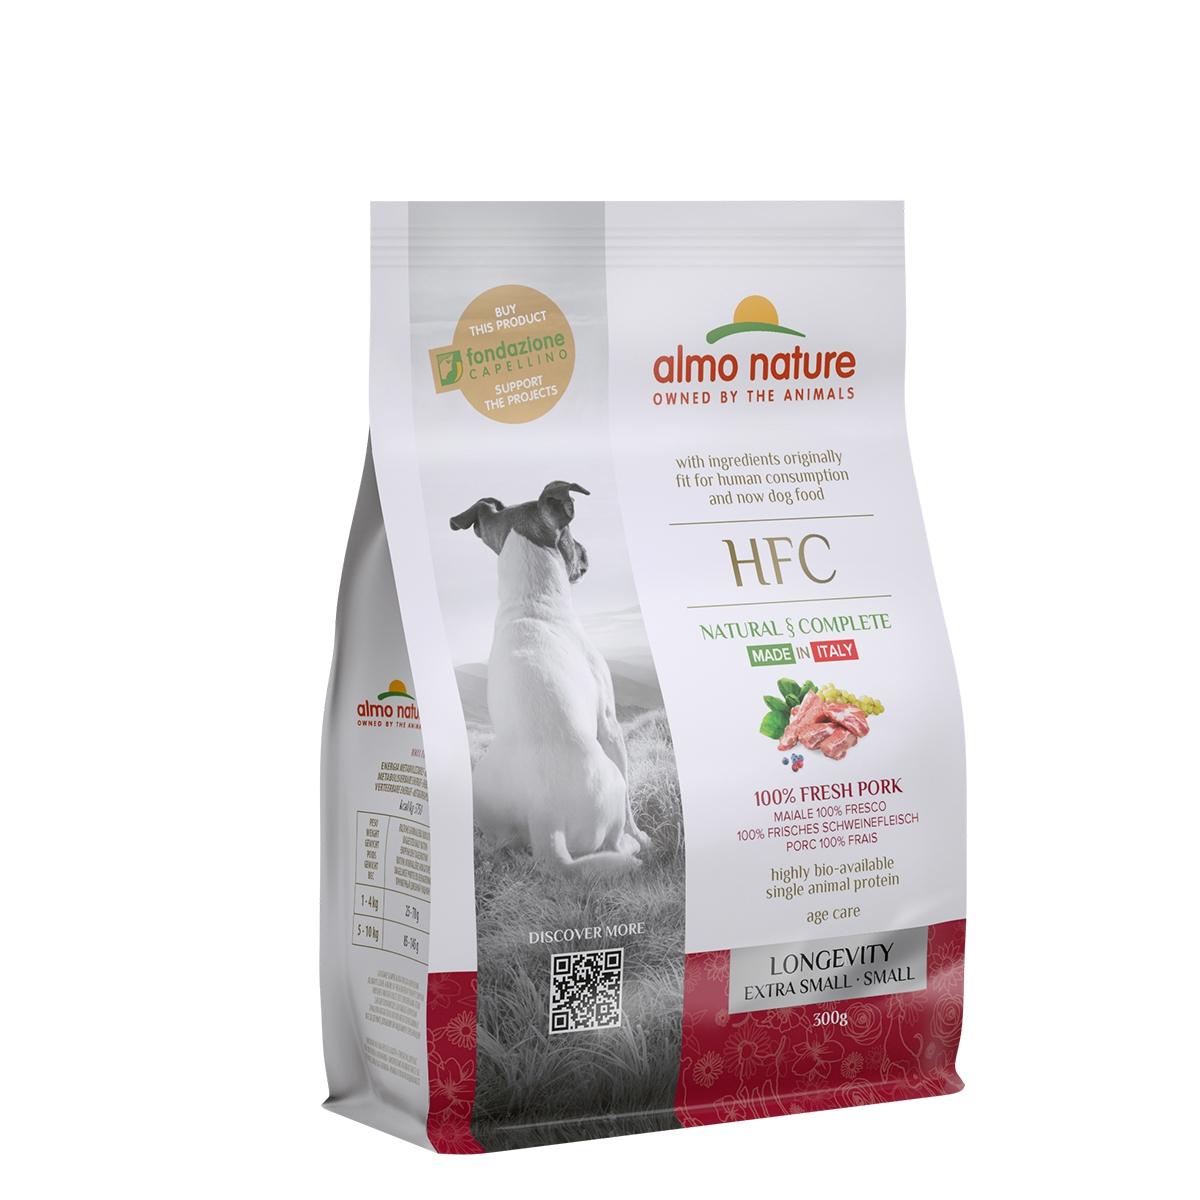 DOG DRY HFC ADULT SMALL LONGEVITY CERDO 300G